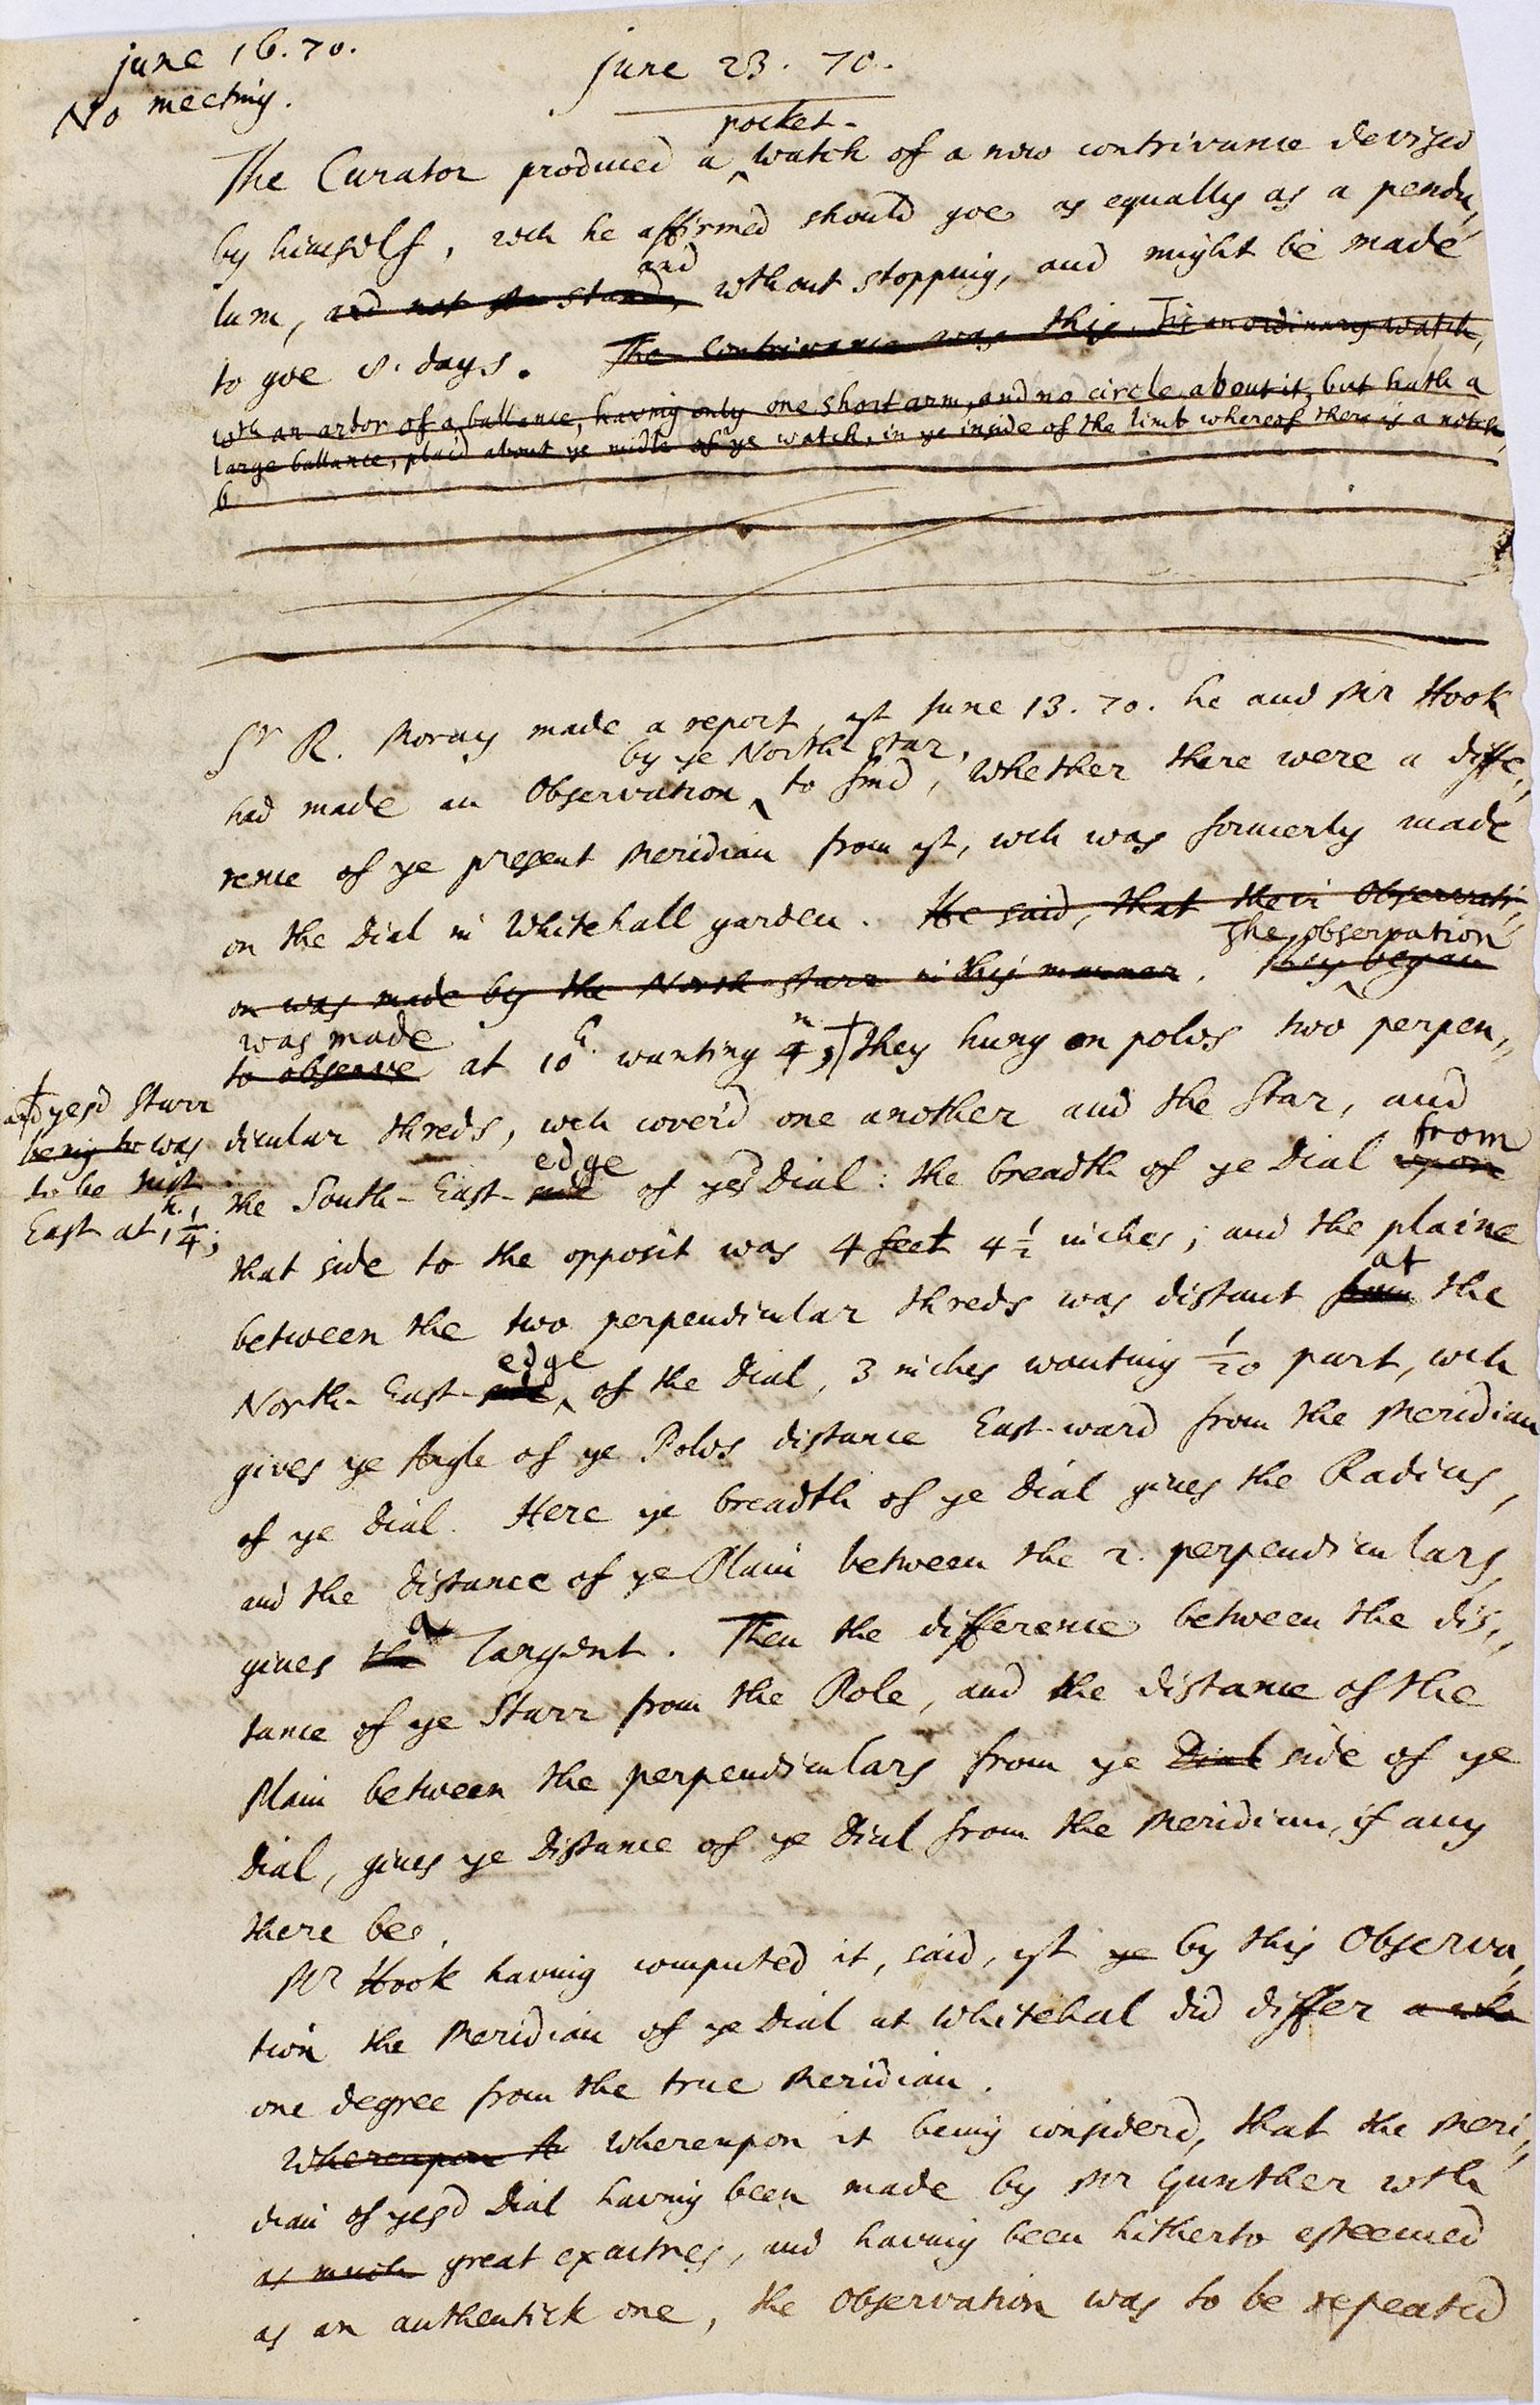 Rober Hooke folio June 23 1670